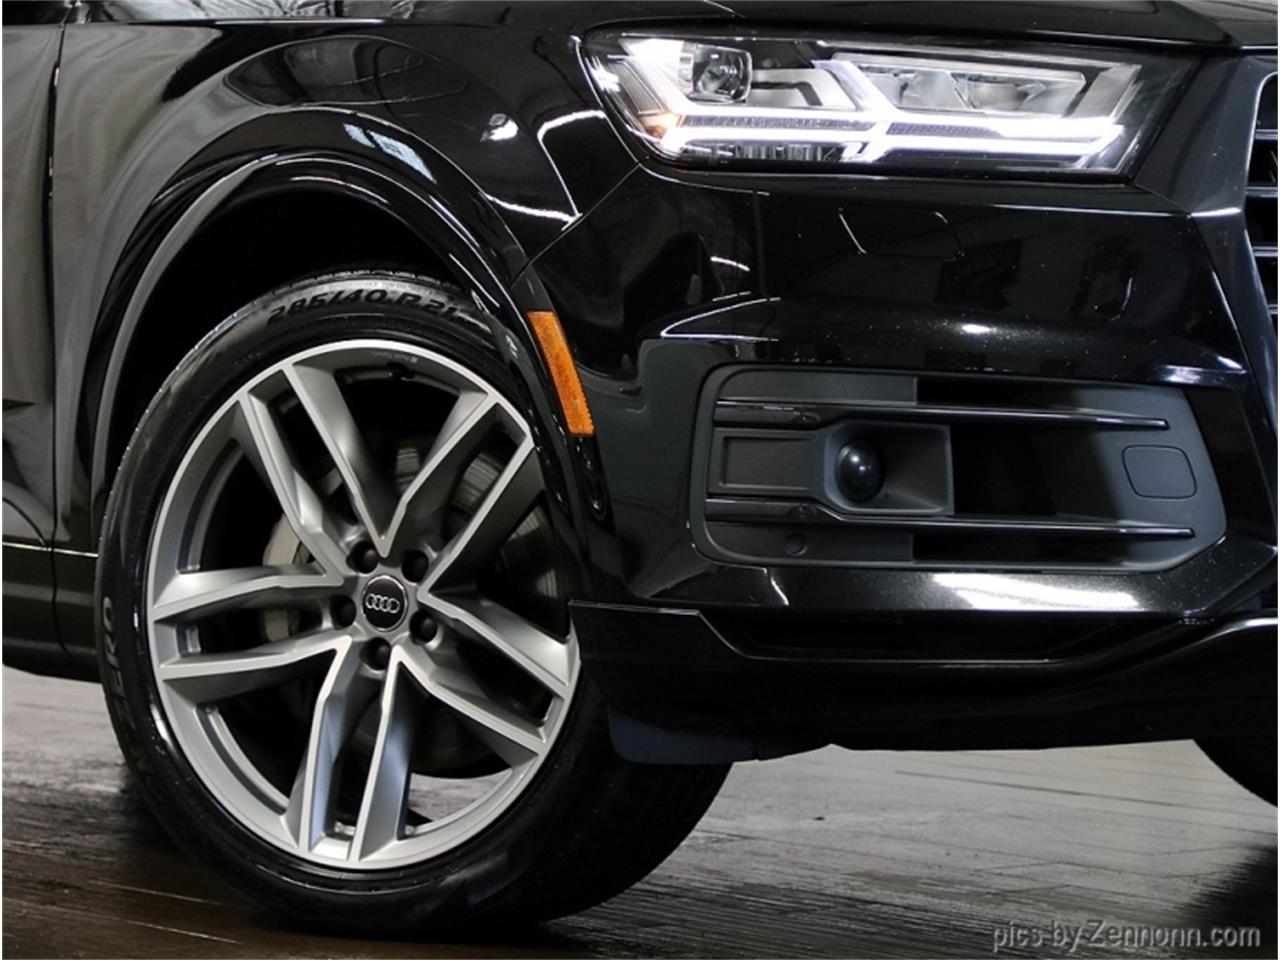 2018 Audi Q7 (CC-1368863) for sale in Addison, Illinois